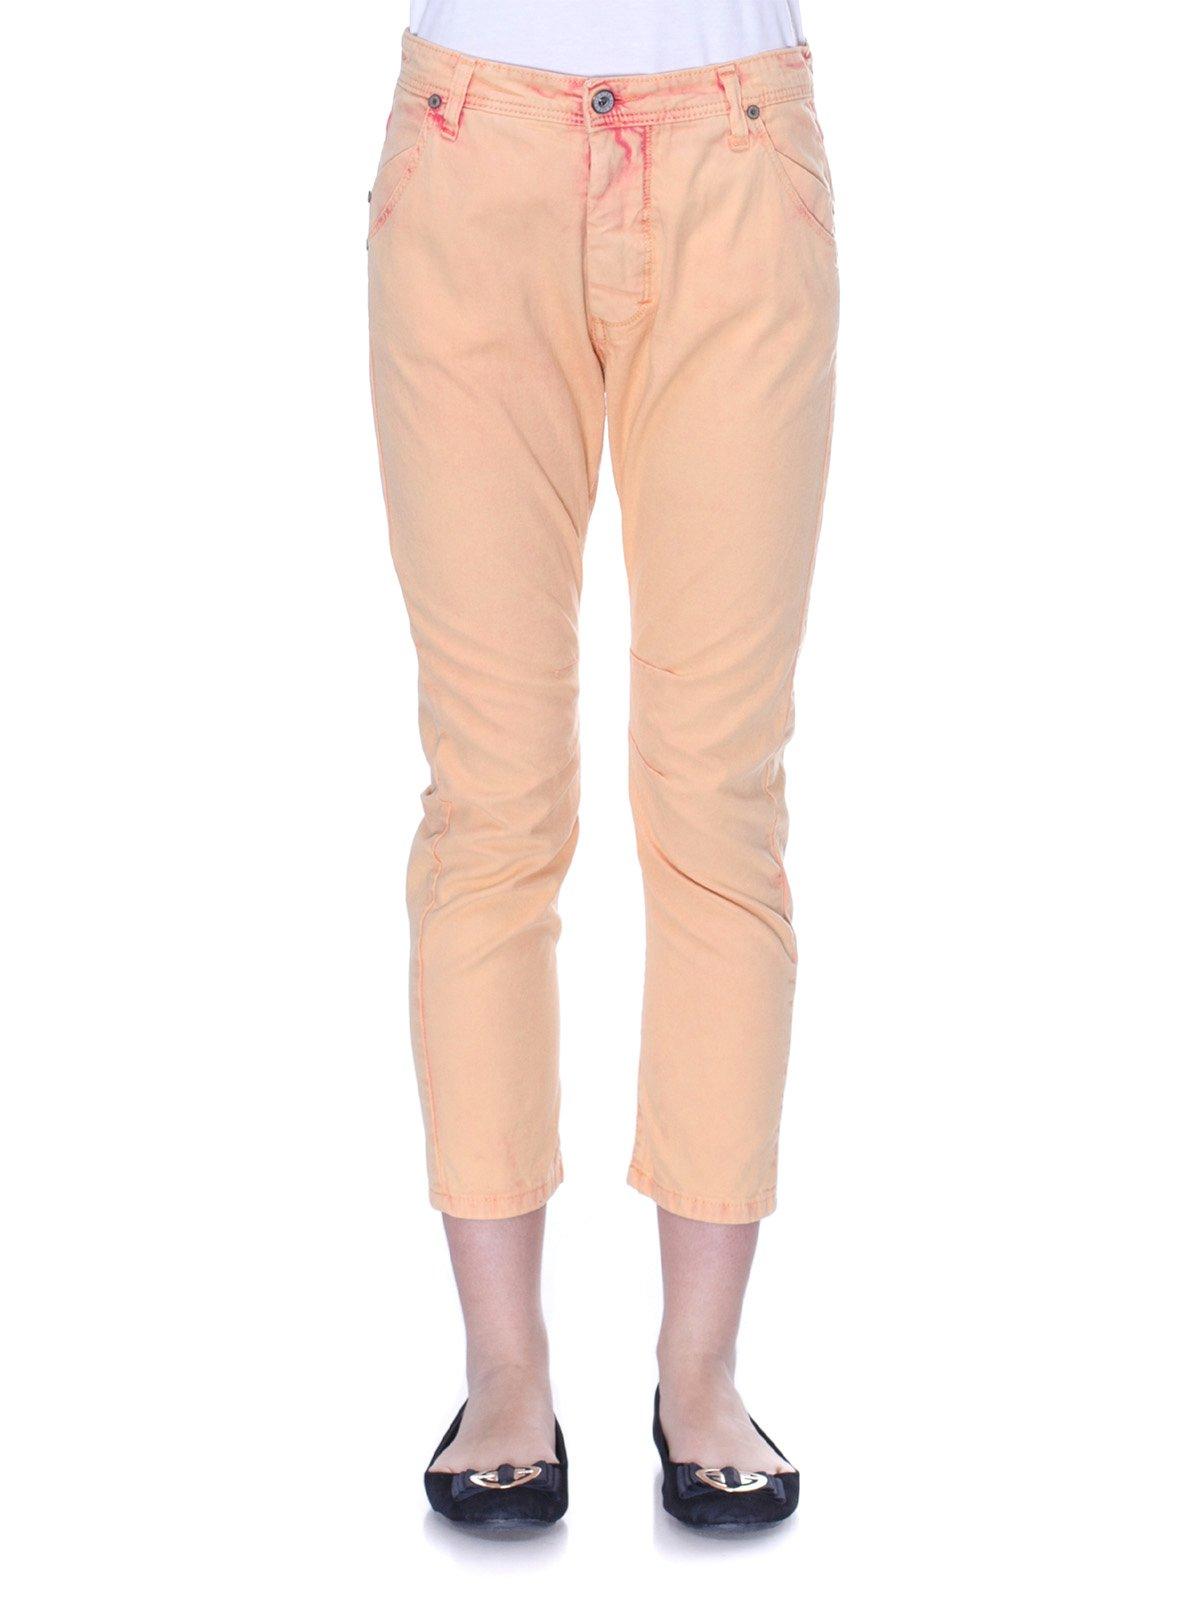 Брюки персикового цвета   3114156   фото 2